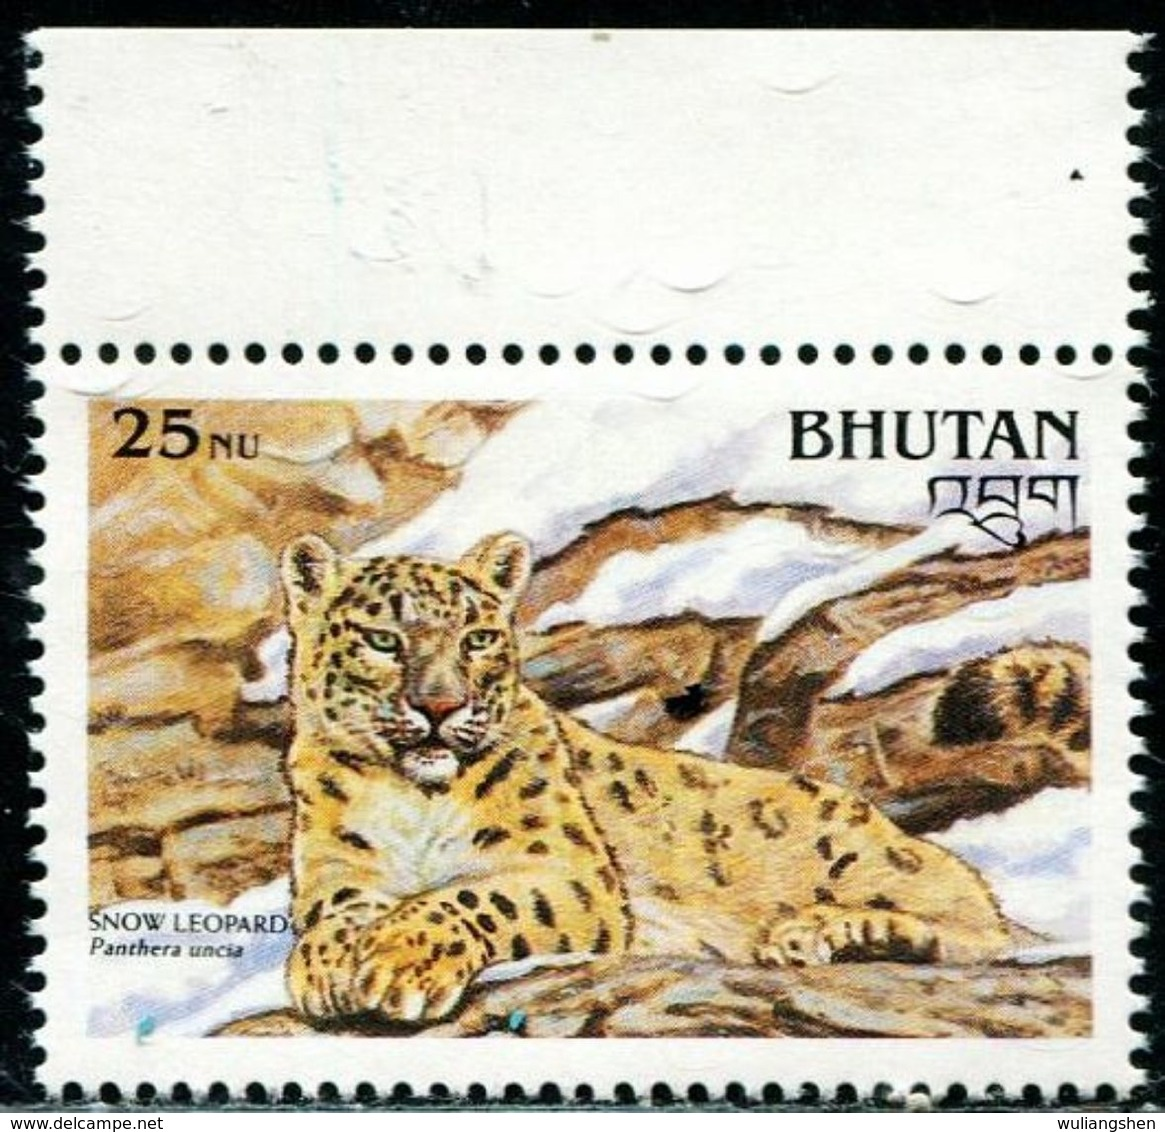 SA0580 Bhutan 1990 WWF Group Foreign Product Snow Leopard 1V MNH - Bhutan